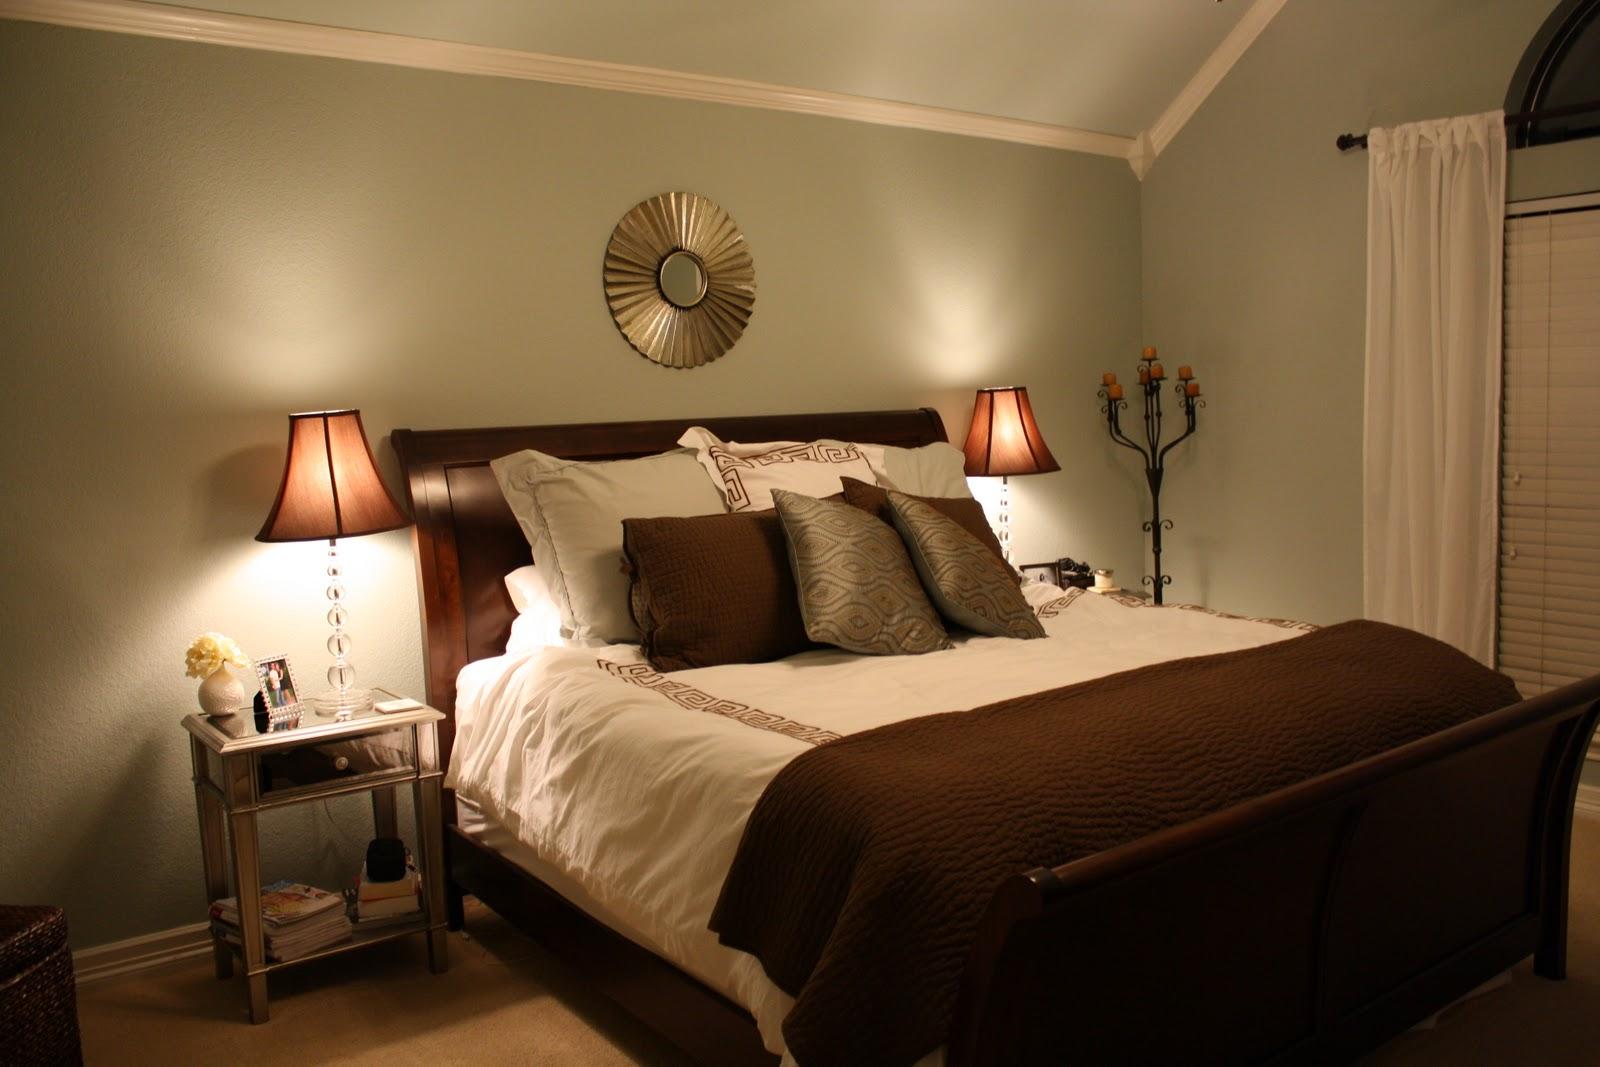 Behr Bedroom Paint Colors